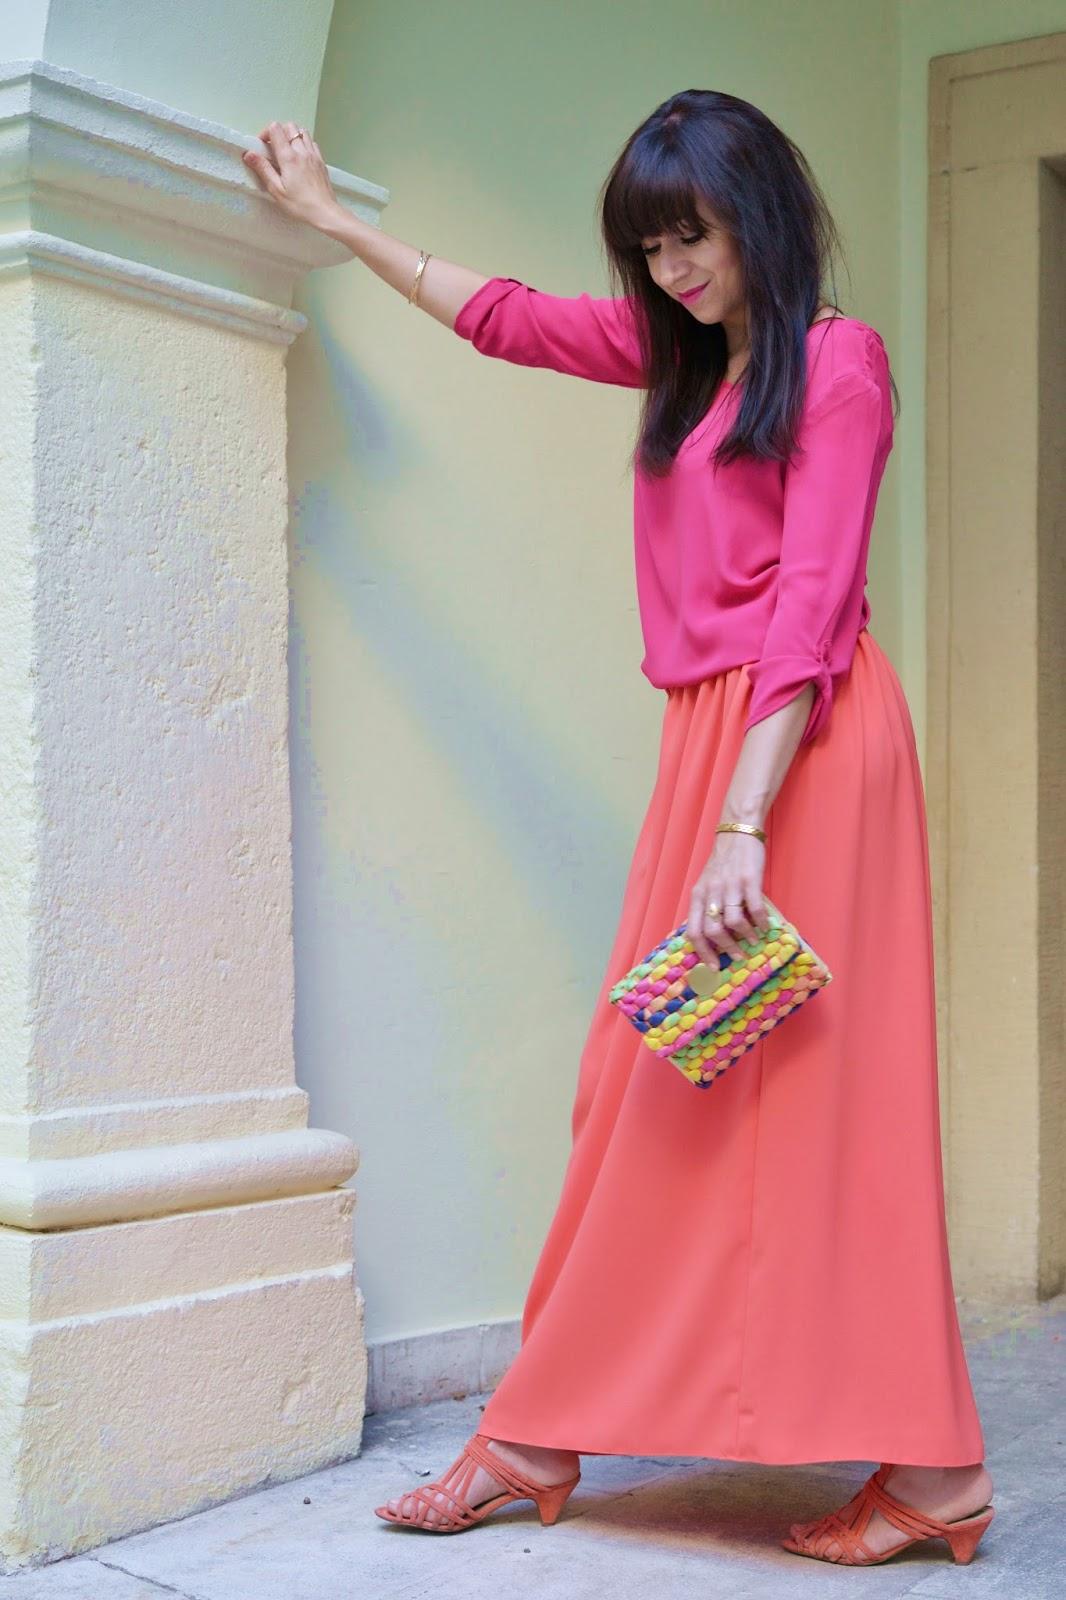 Nosím, čo chcem nosiť ja!? Katharine-fashion is beautiful